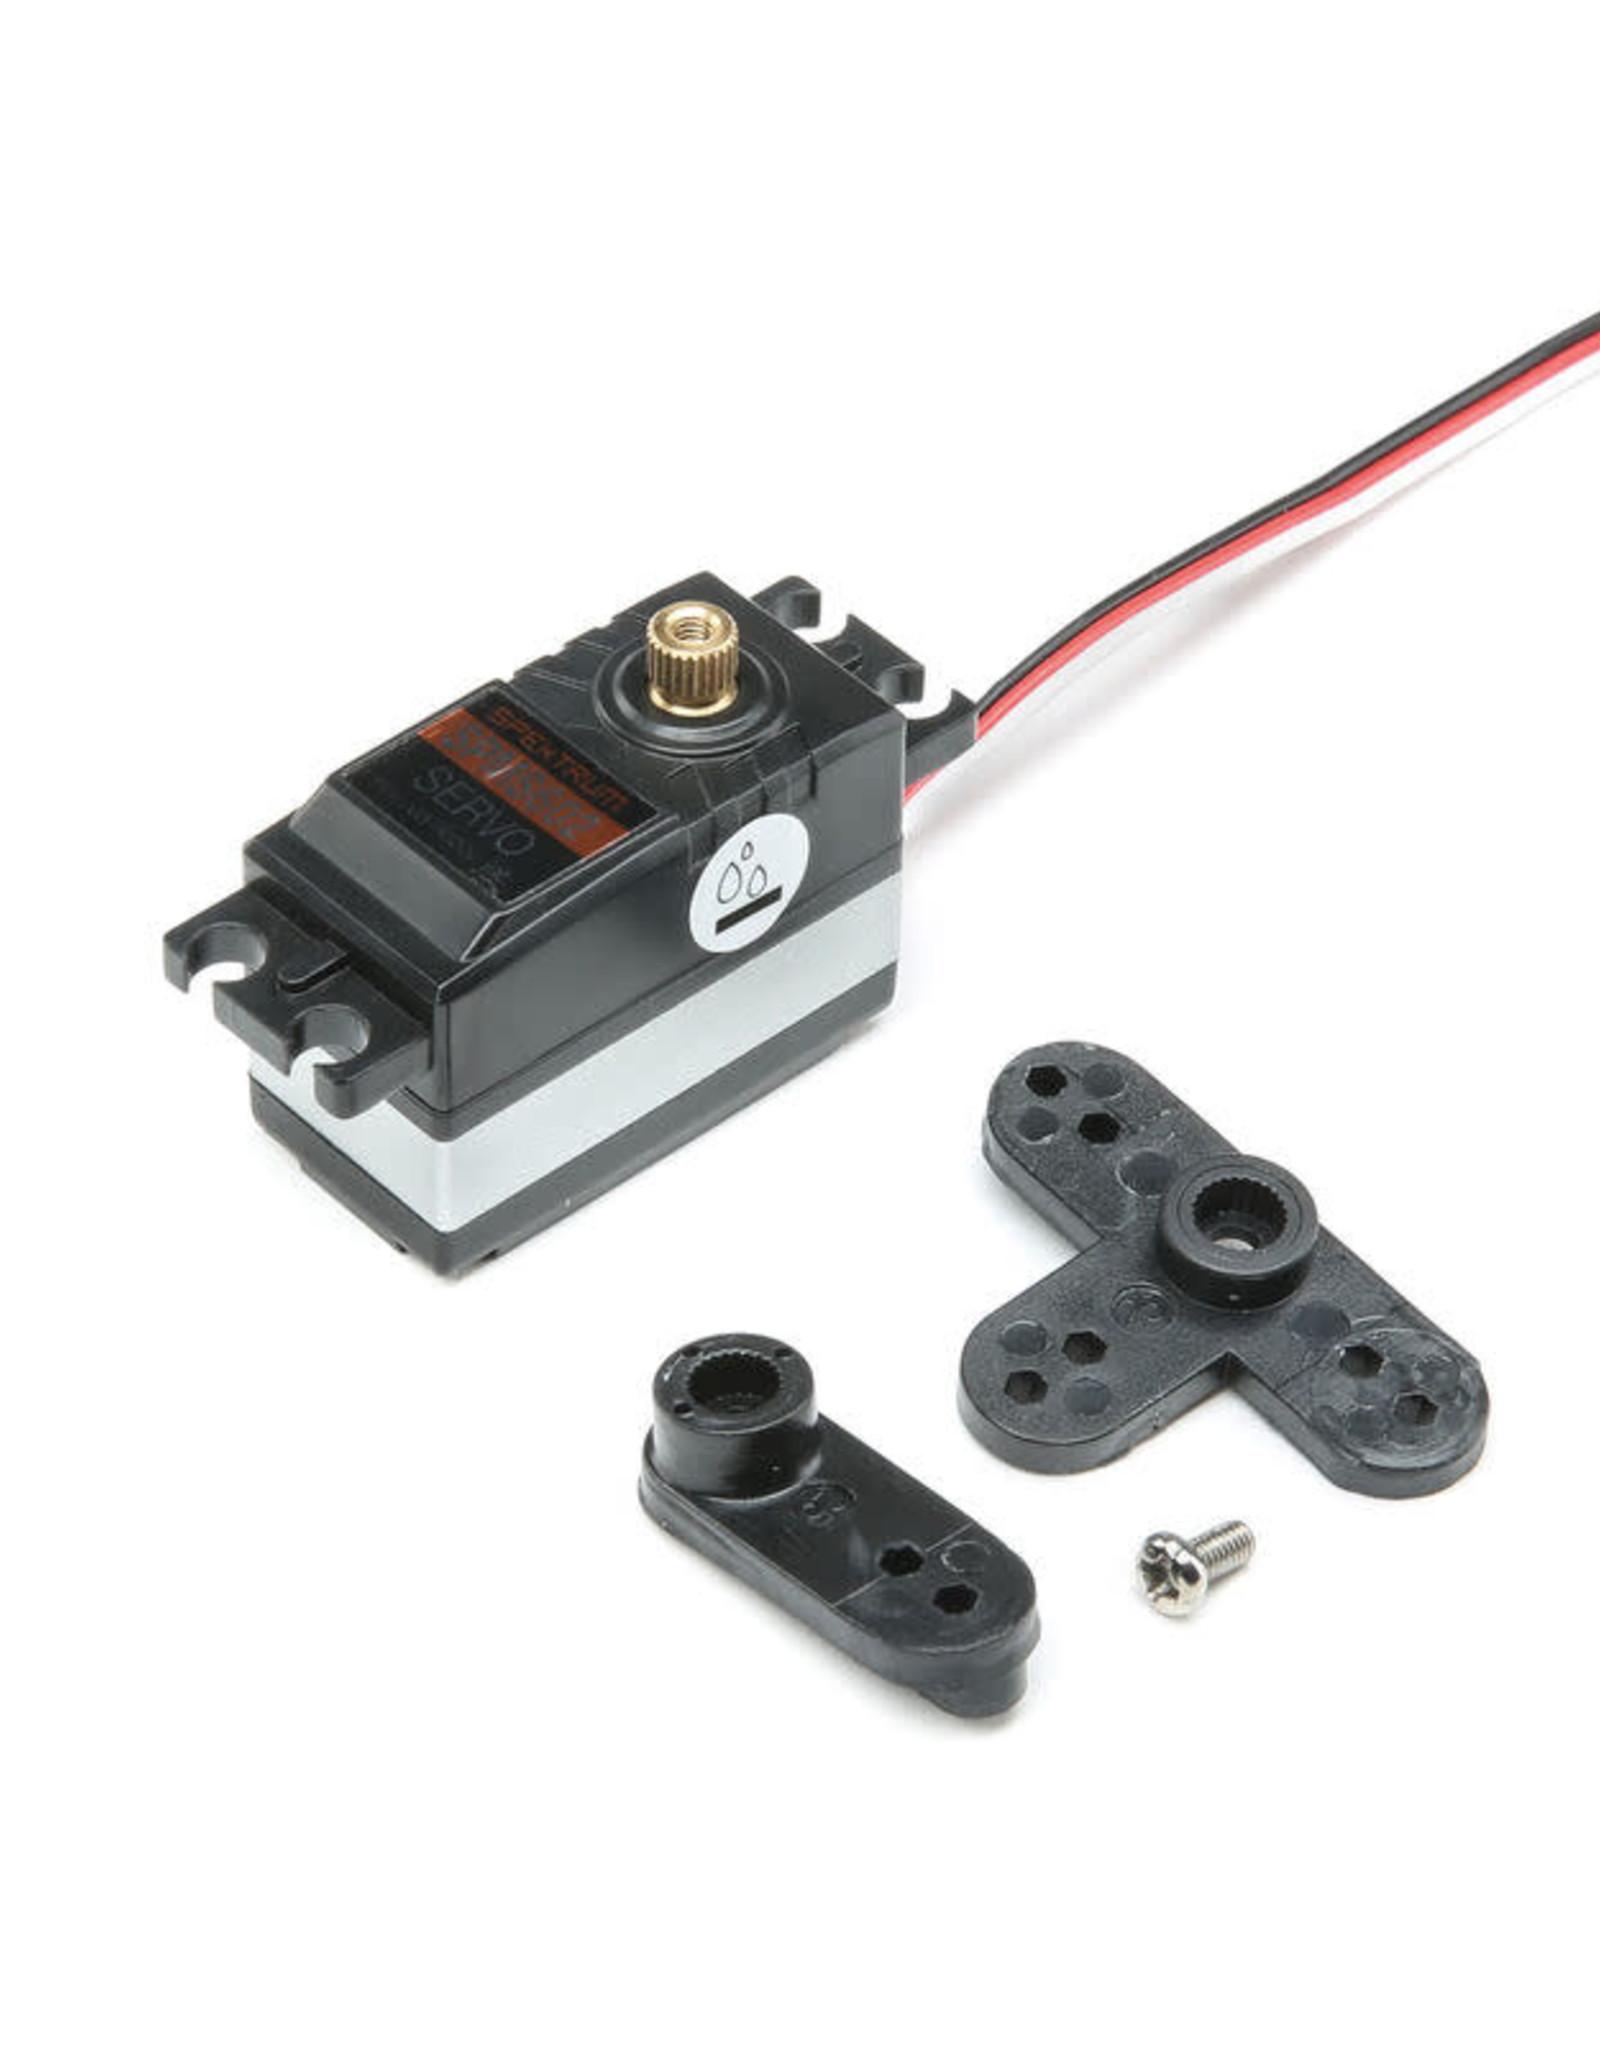 spektrum SPMS602 Replacement S602 Digital Servo